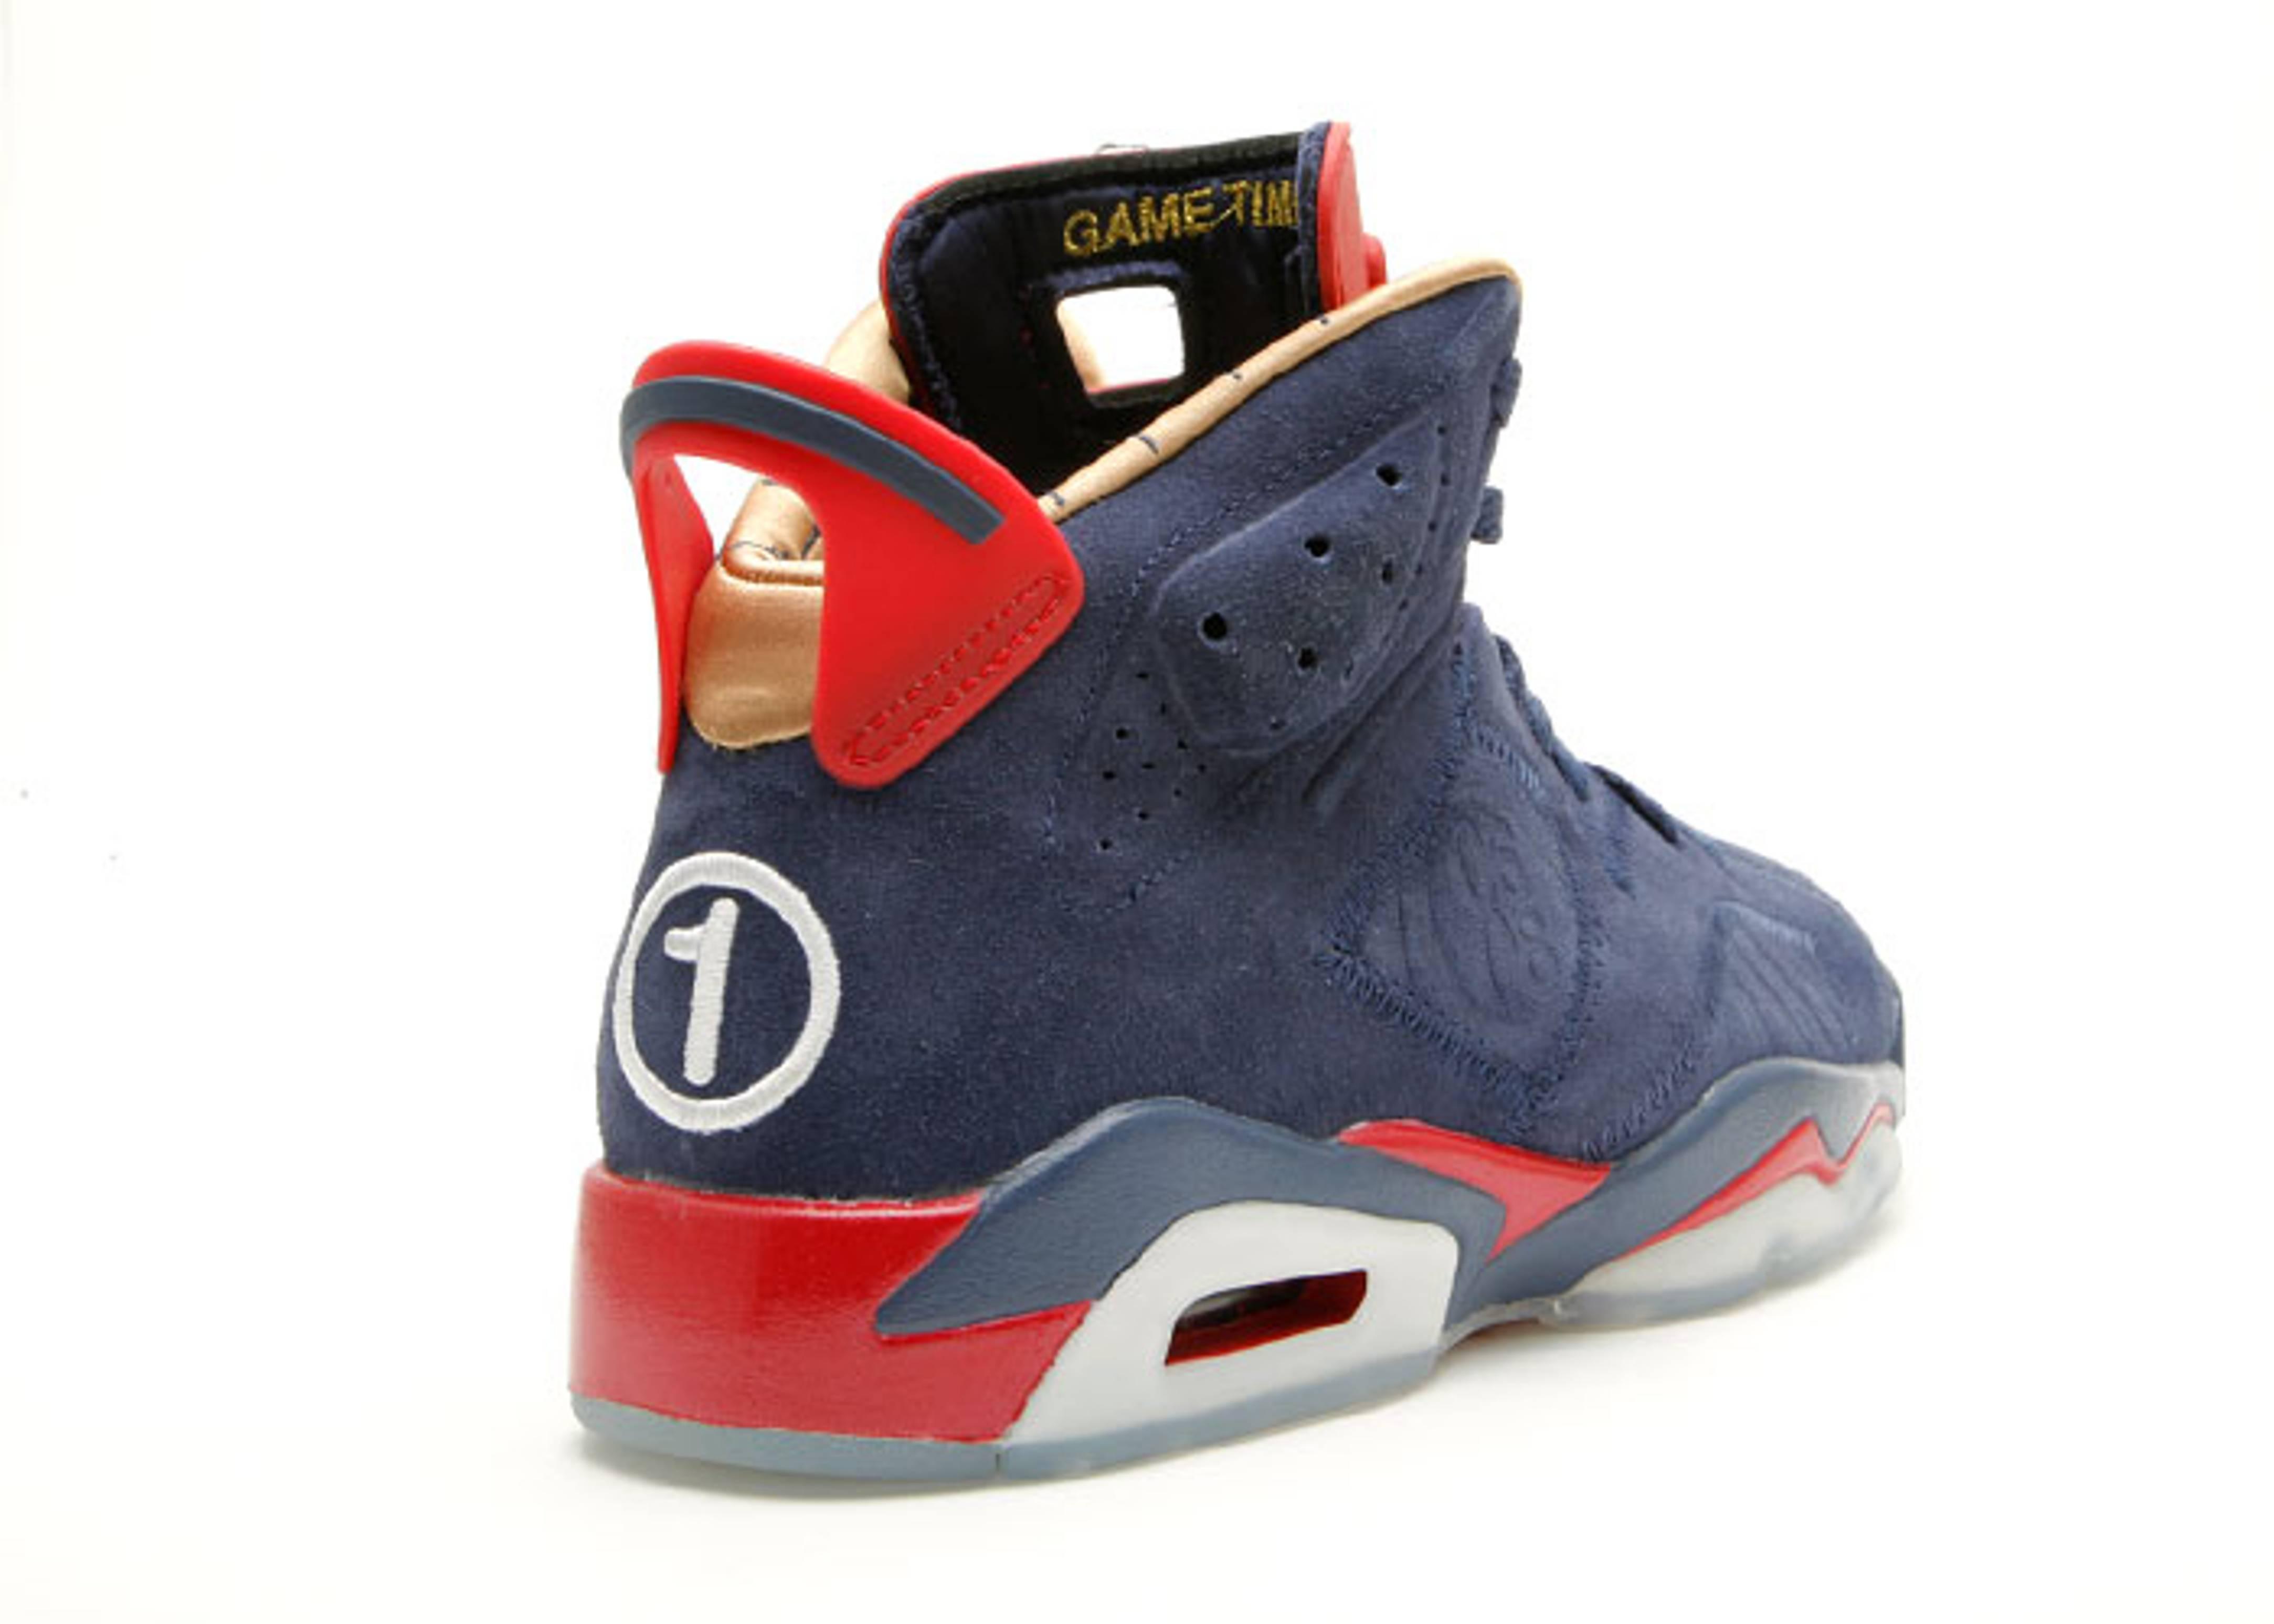 new styles 3d7ea e3cff Air Jordan 6 Retro Db